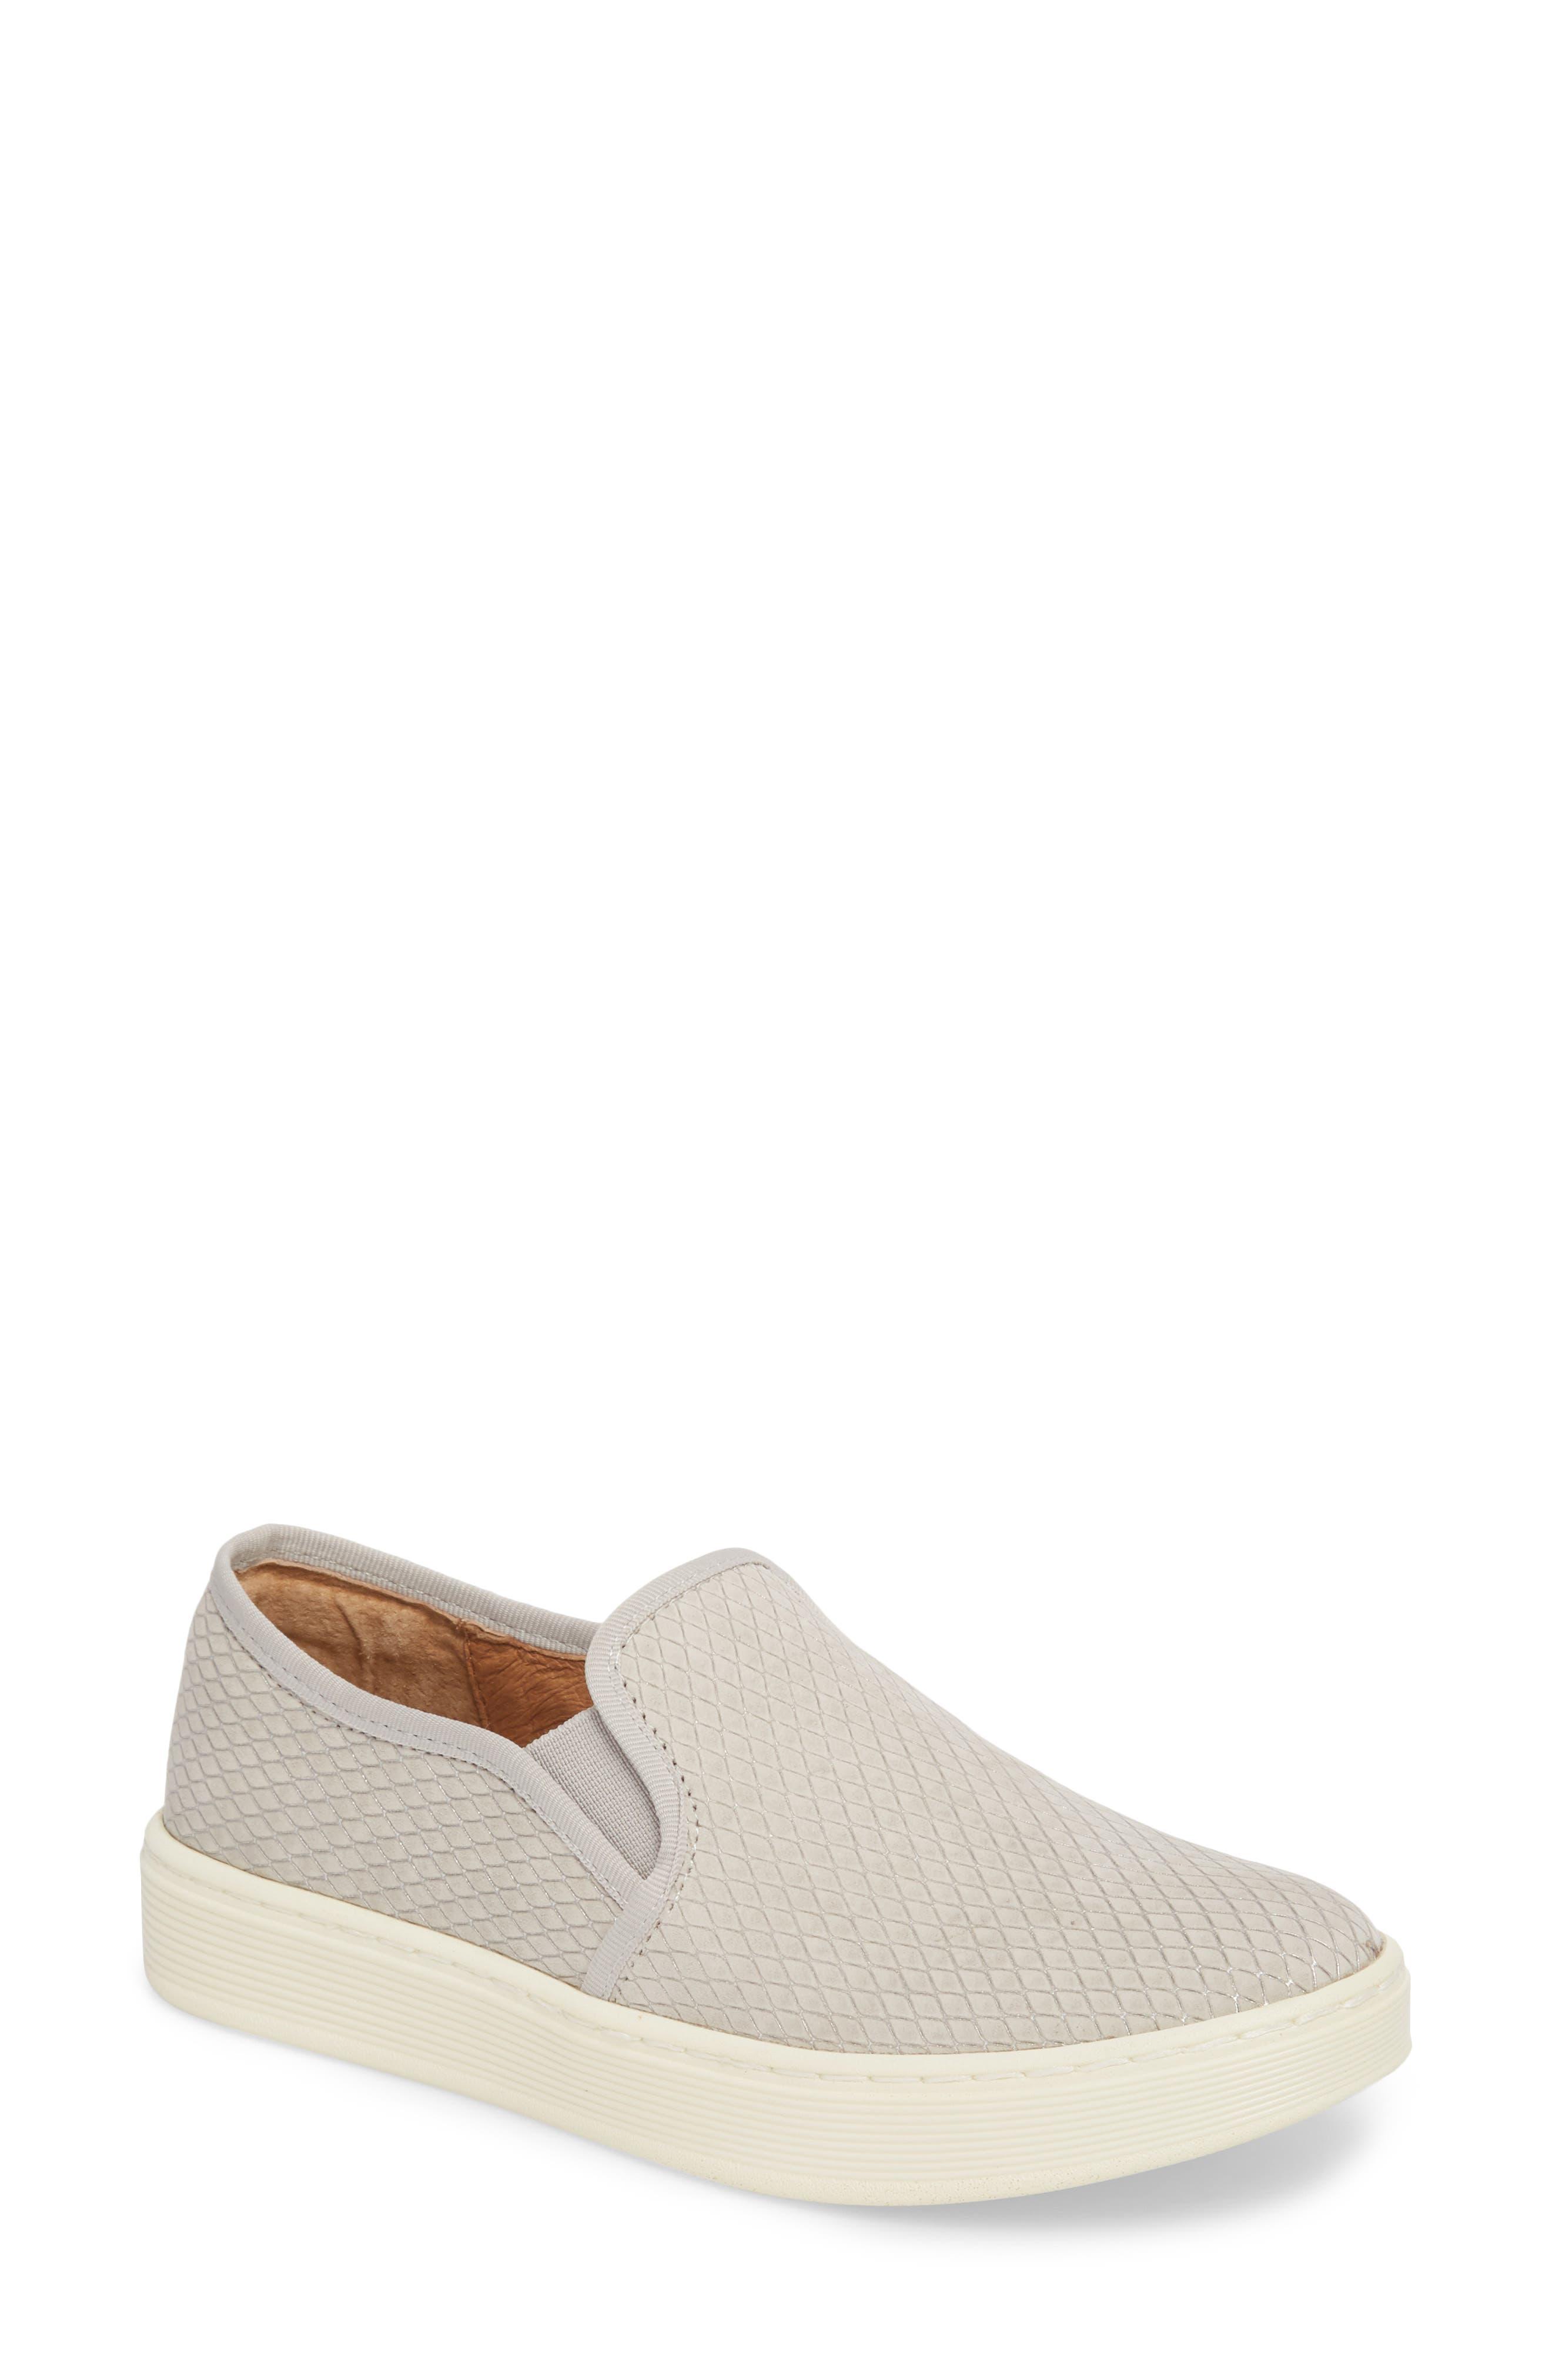 Söfft 'Somers' Slip-On Sneaker (Women)